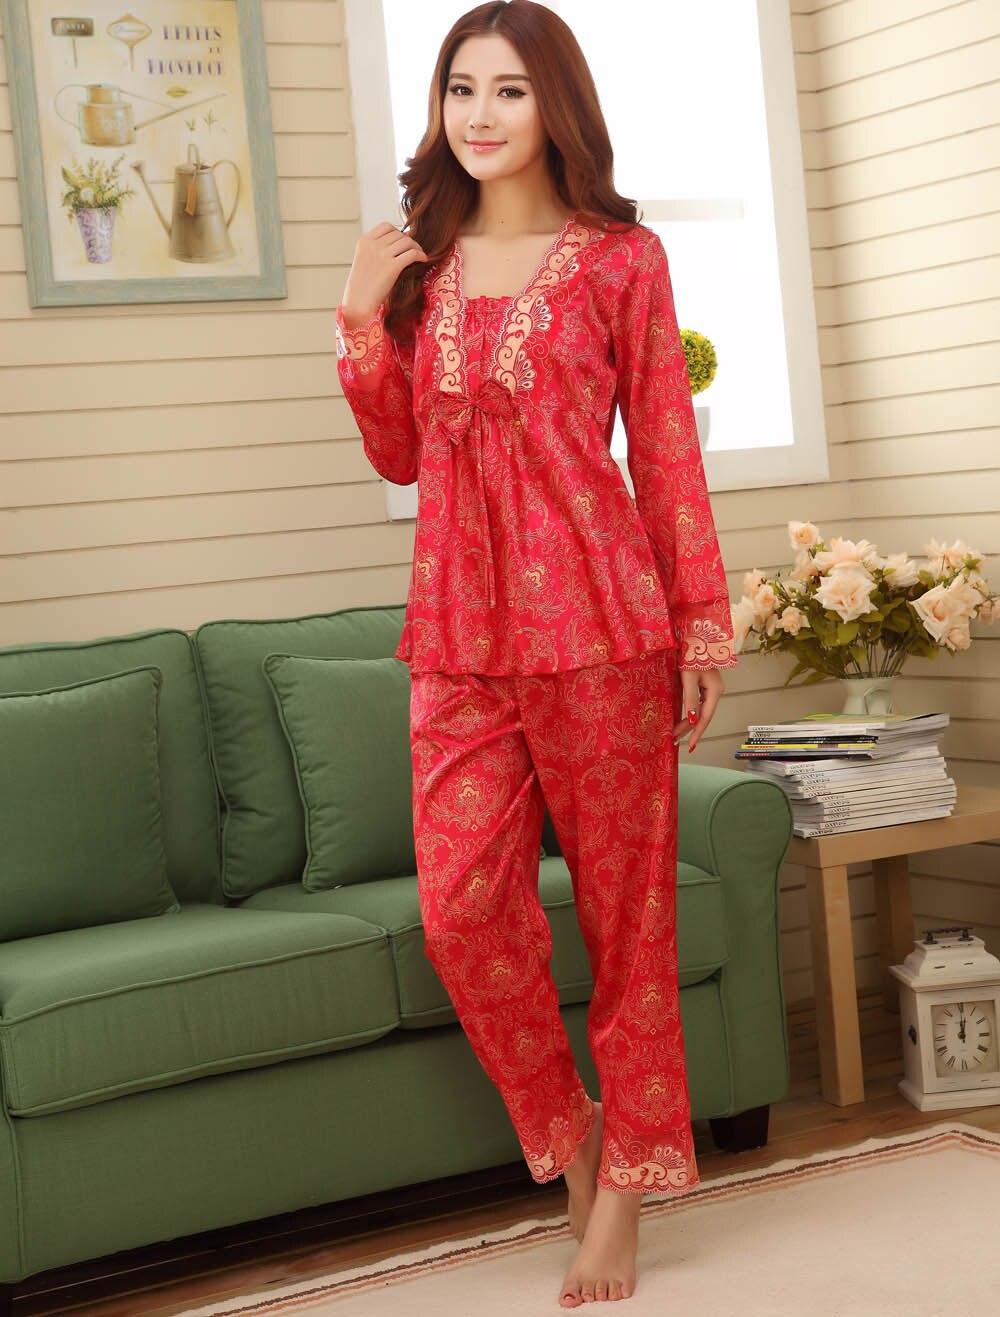 faux silk Couple   Pajama     Sets   for men women female homewear lounge male pyjamas wedding nightgowns marriage pijamas nightwears